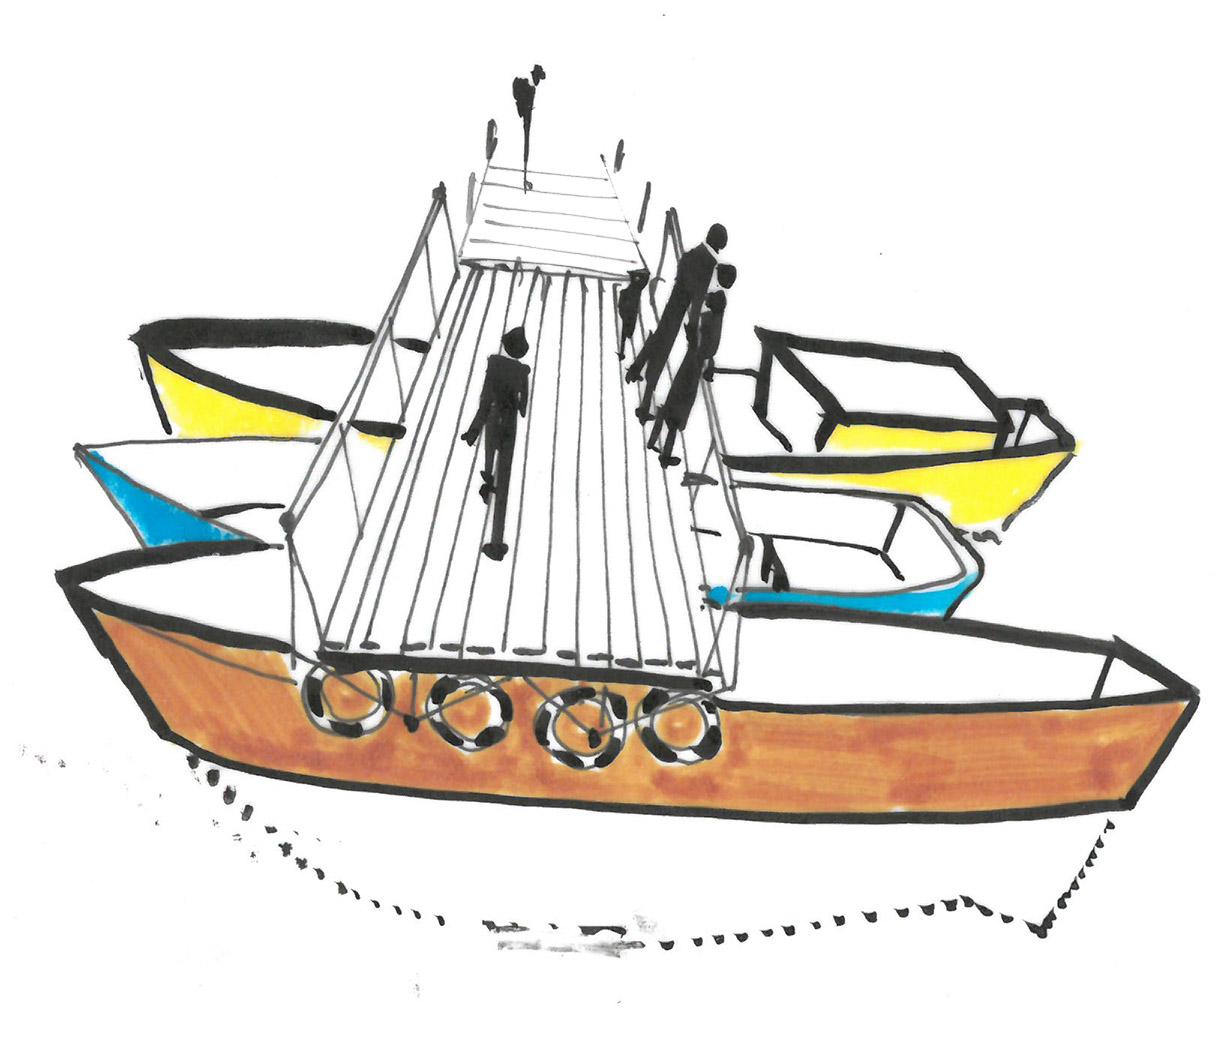 Ash Sakula drawings photos